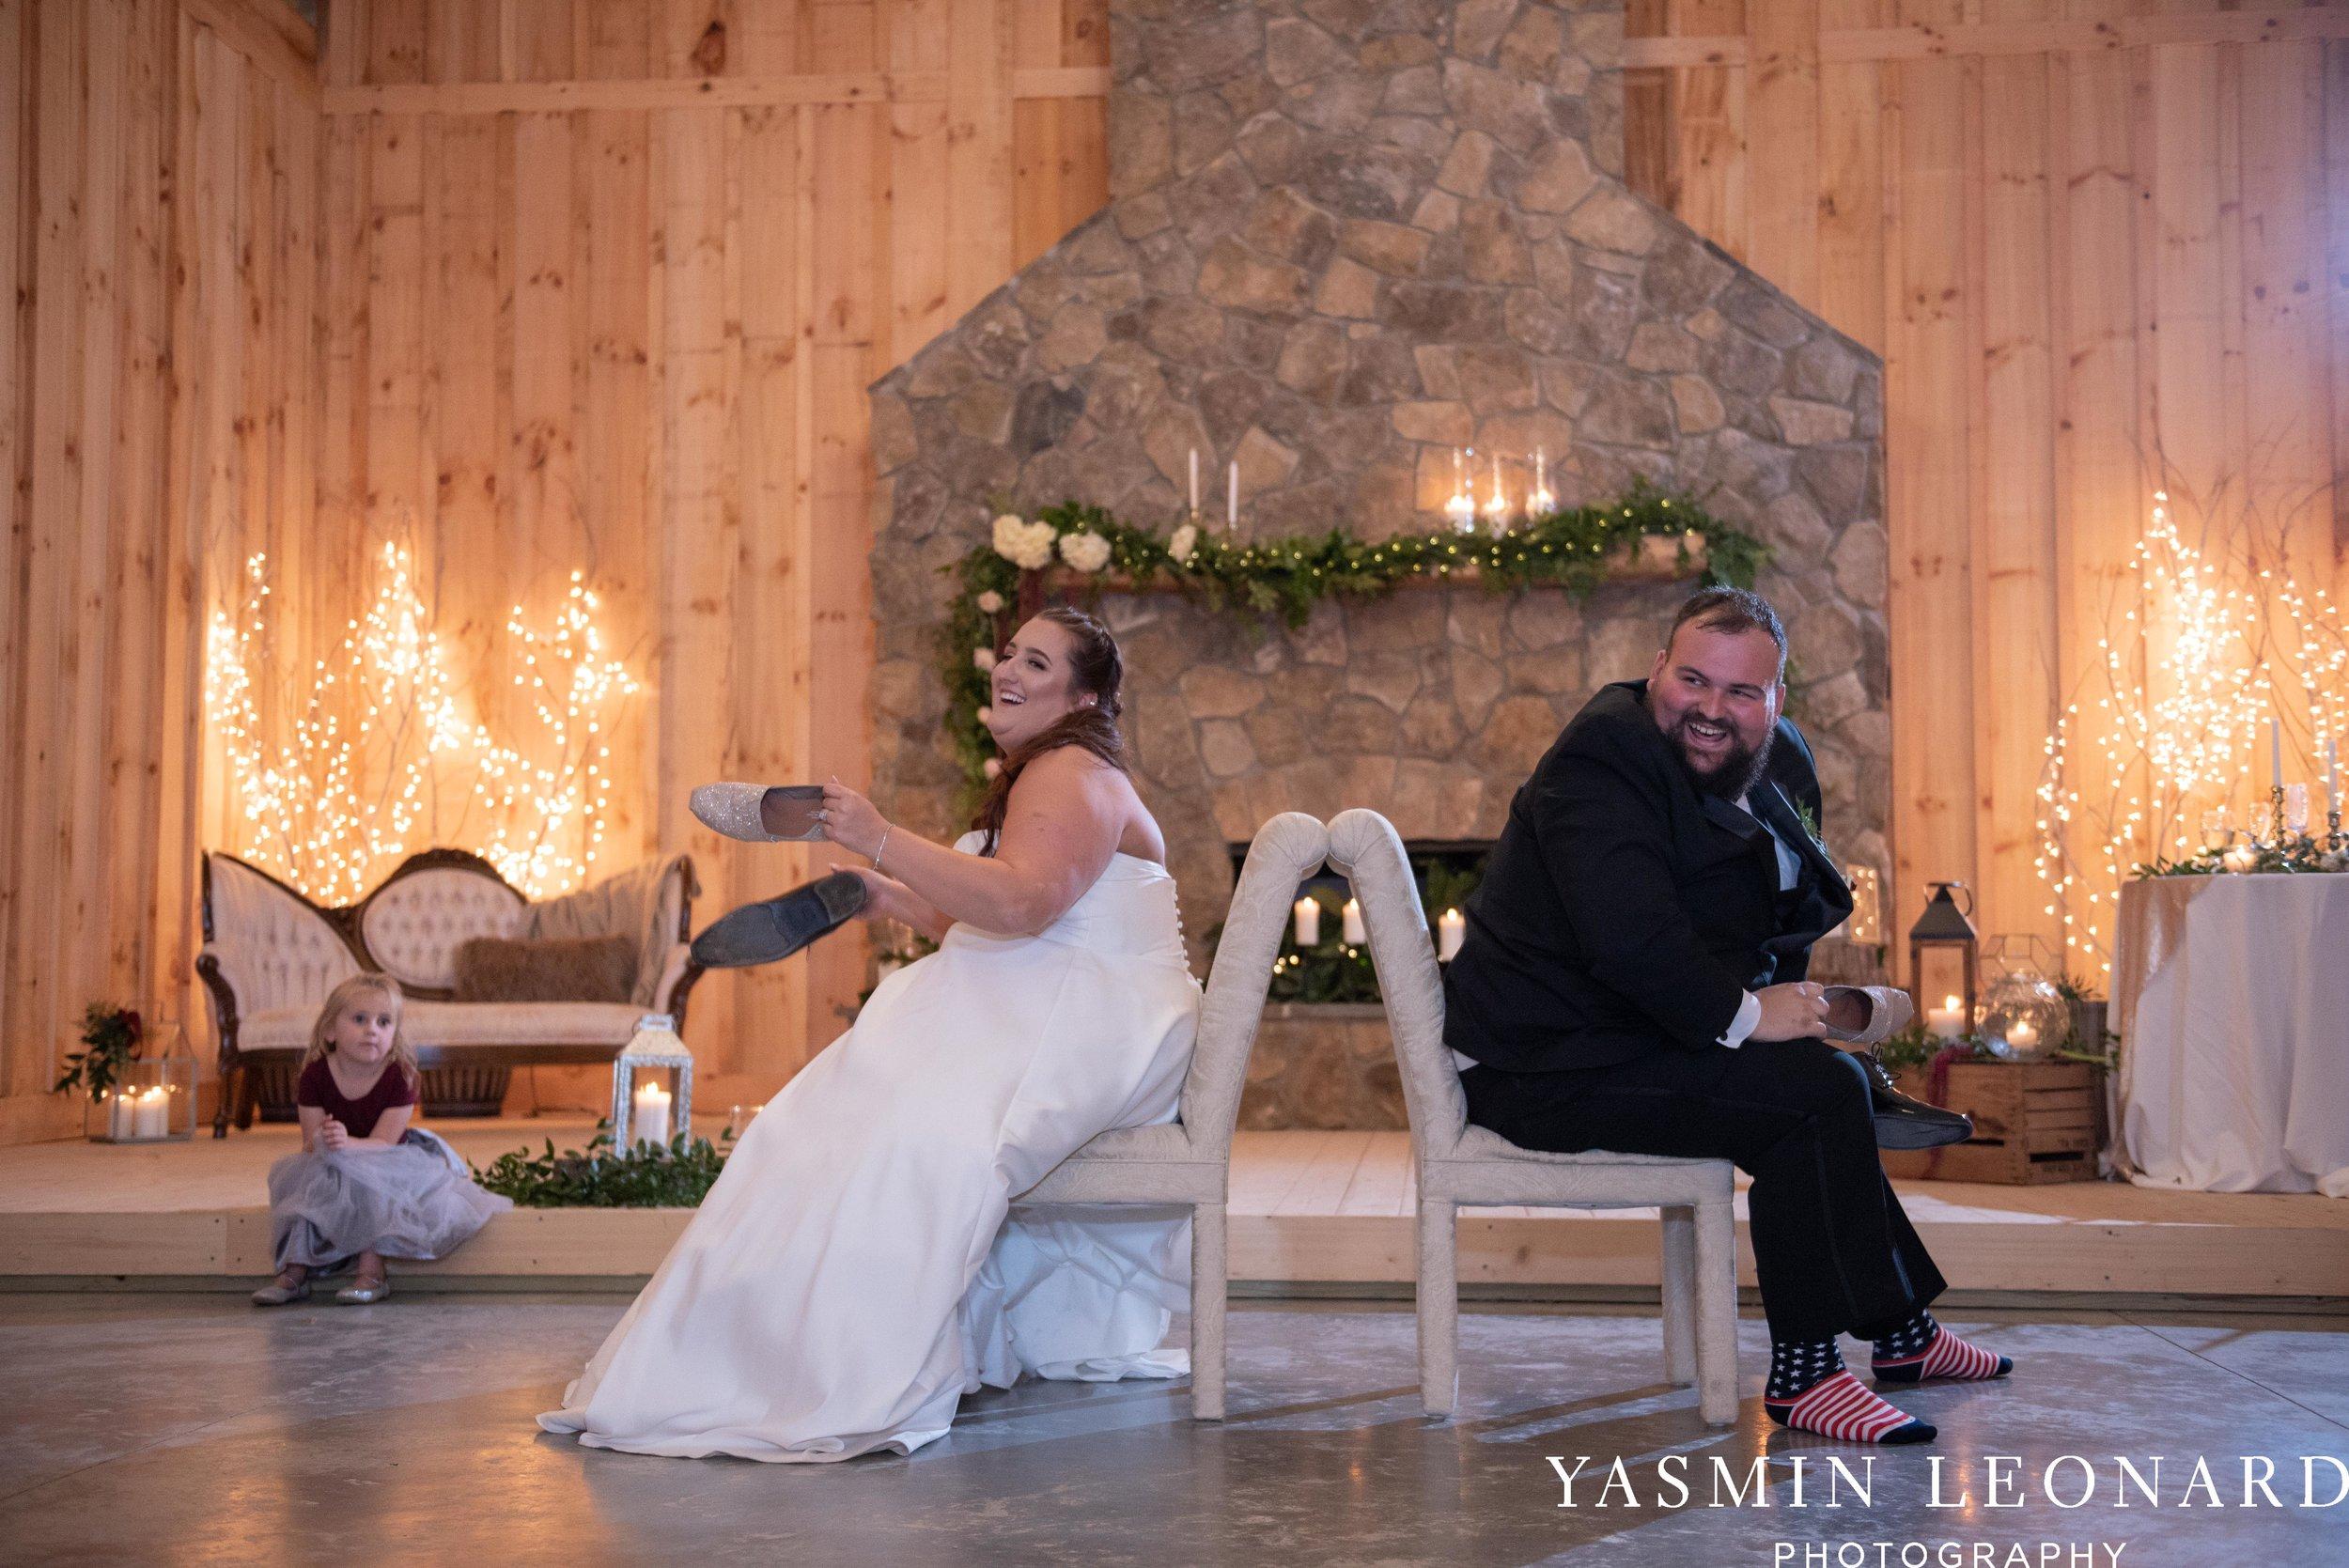 Wesley Memorial United Methodist Church - Old Homeplace Winery - High Point Weddings - High Point Wedding Photographer - NC Weddings - NC Barn Venue - Yasmin Leonard Photography-58.jpg